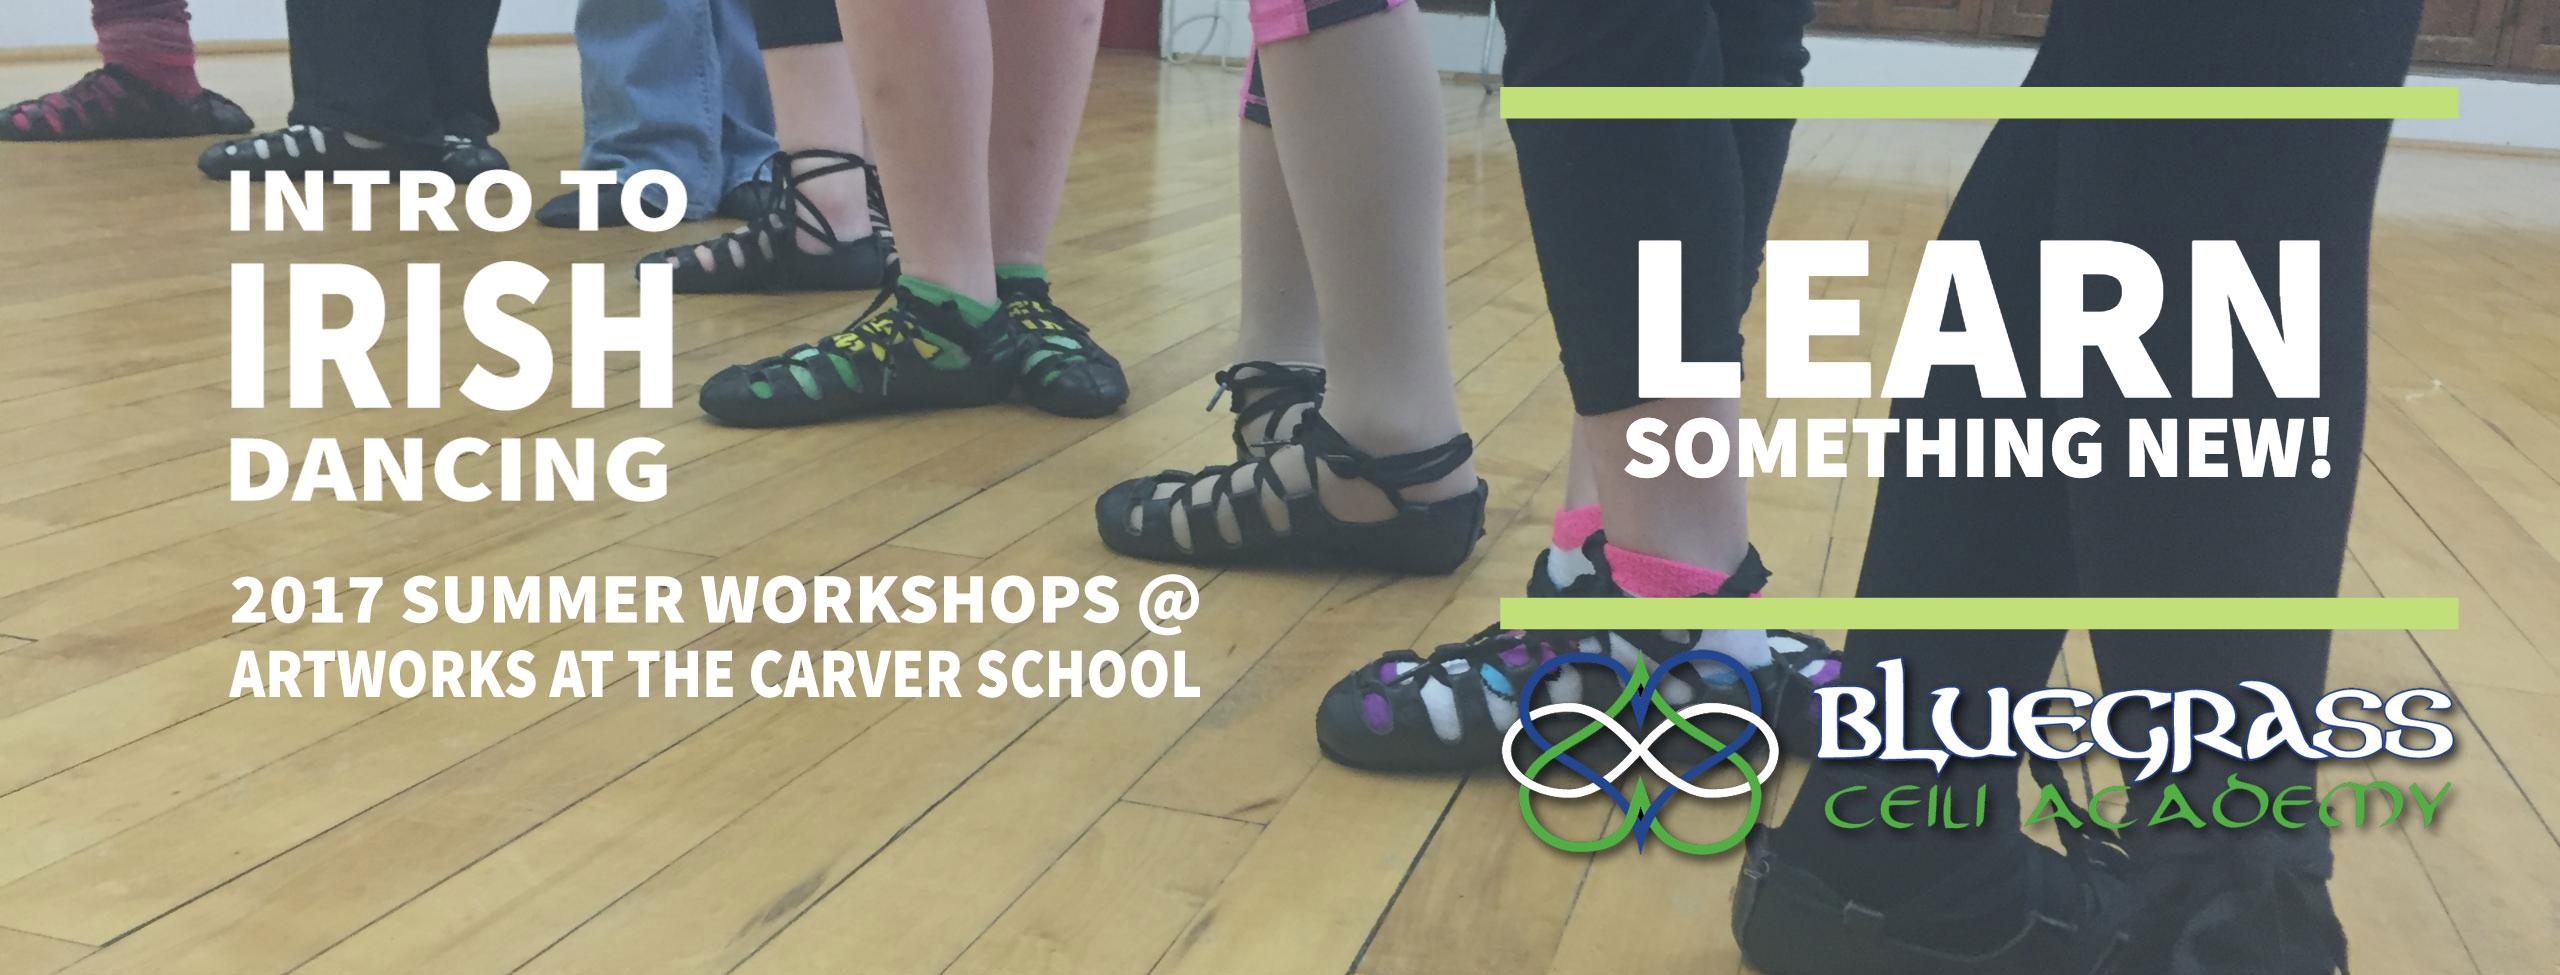 Learn Irish dance in Lexington this summer!